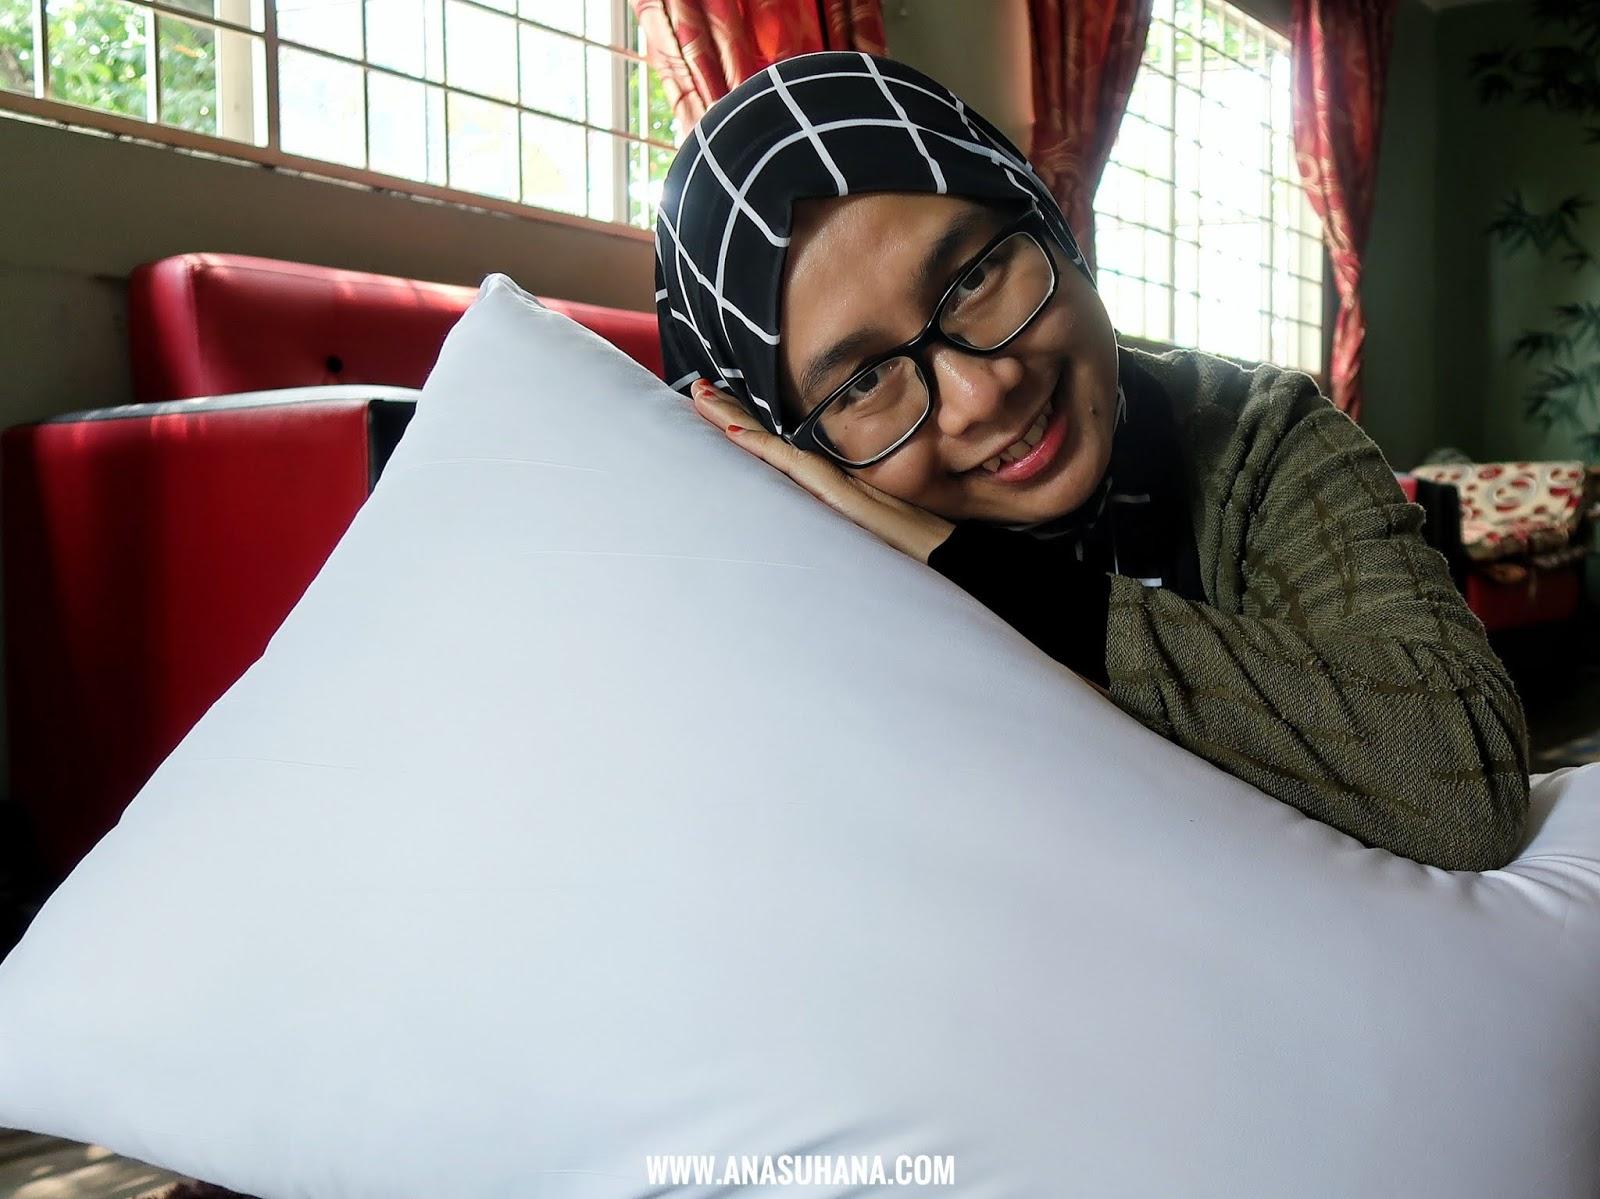 Tidur Lena dan Selesa Dengan Bantal Das Abdul Global (DAG)